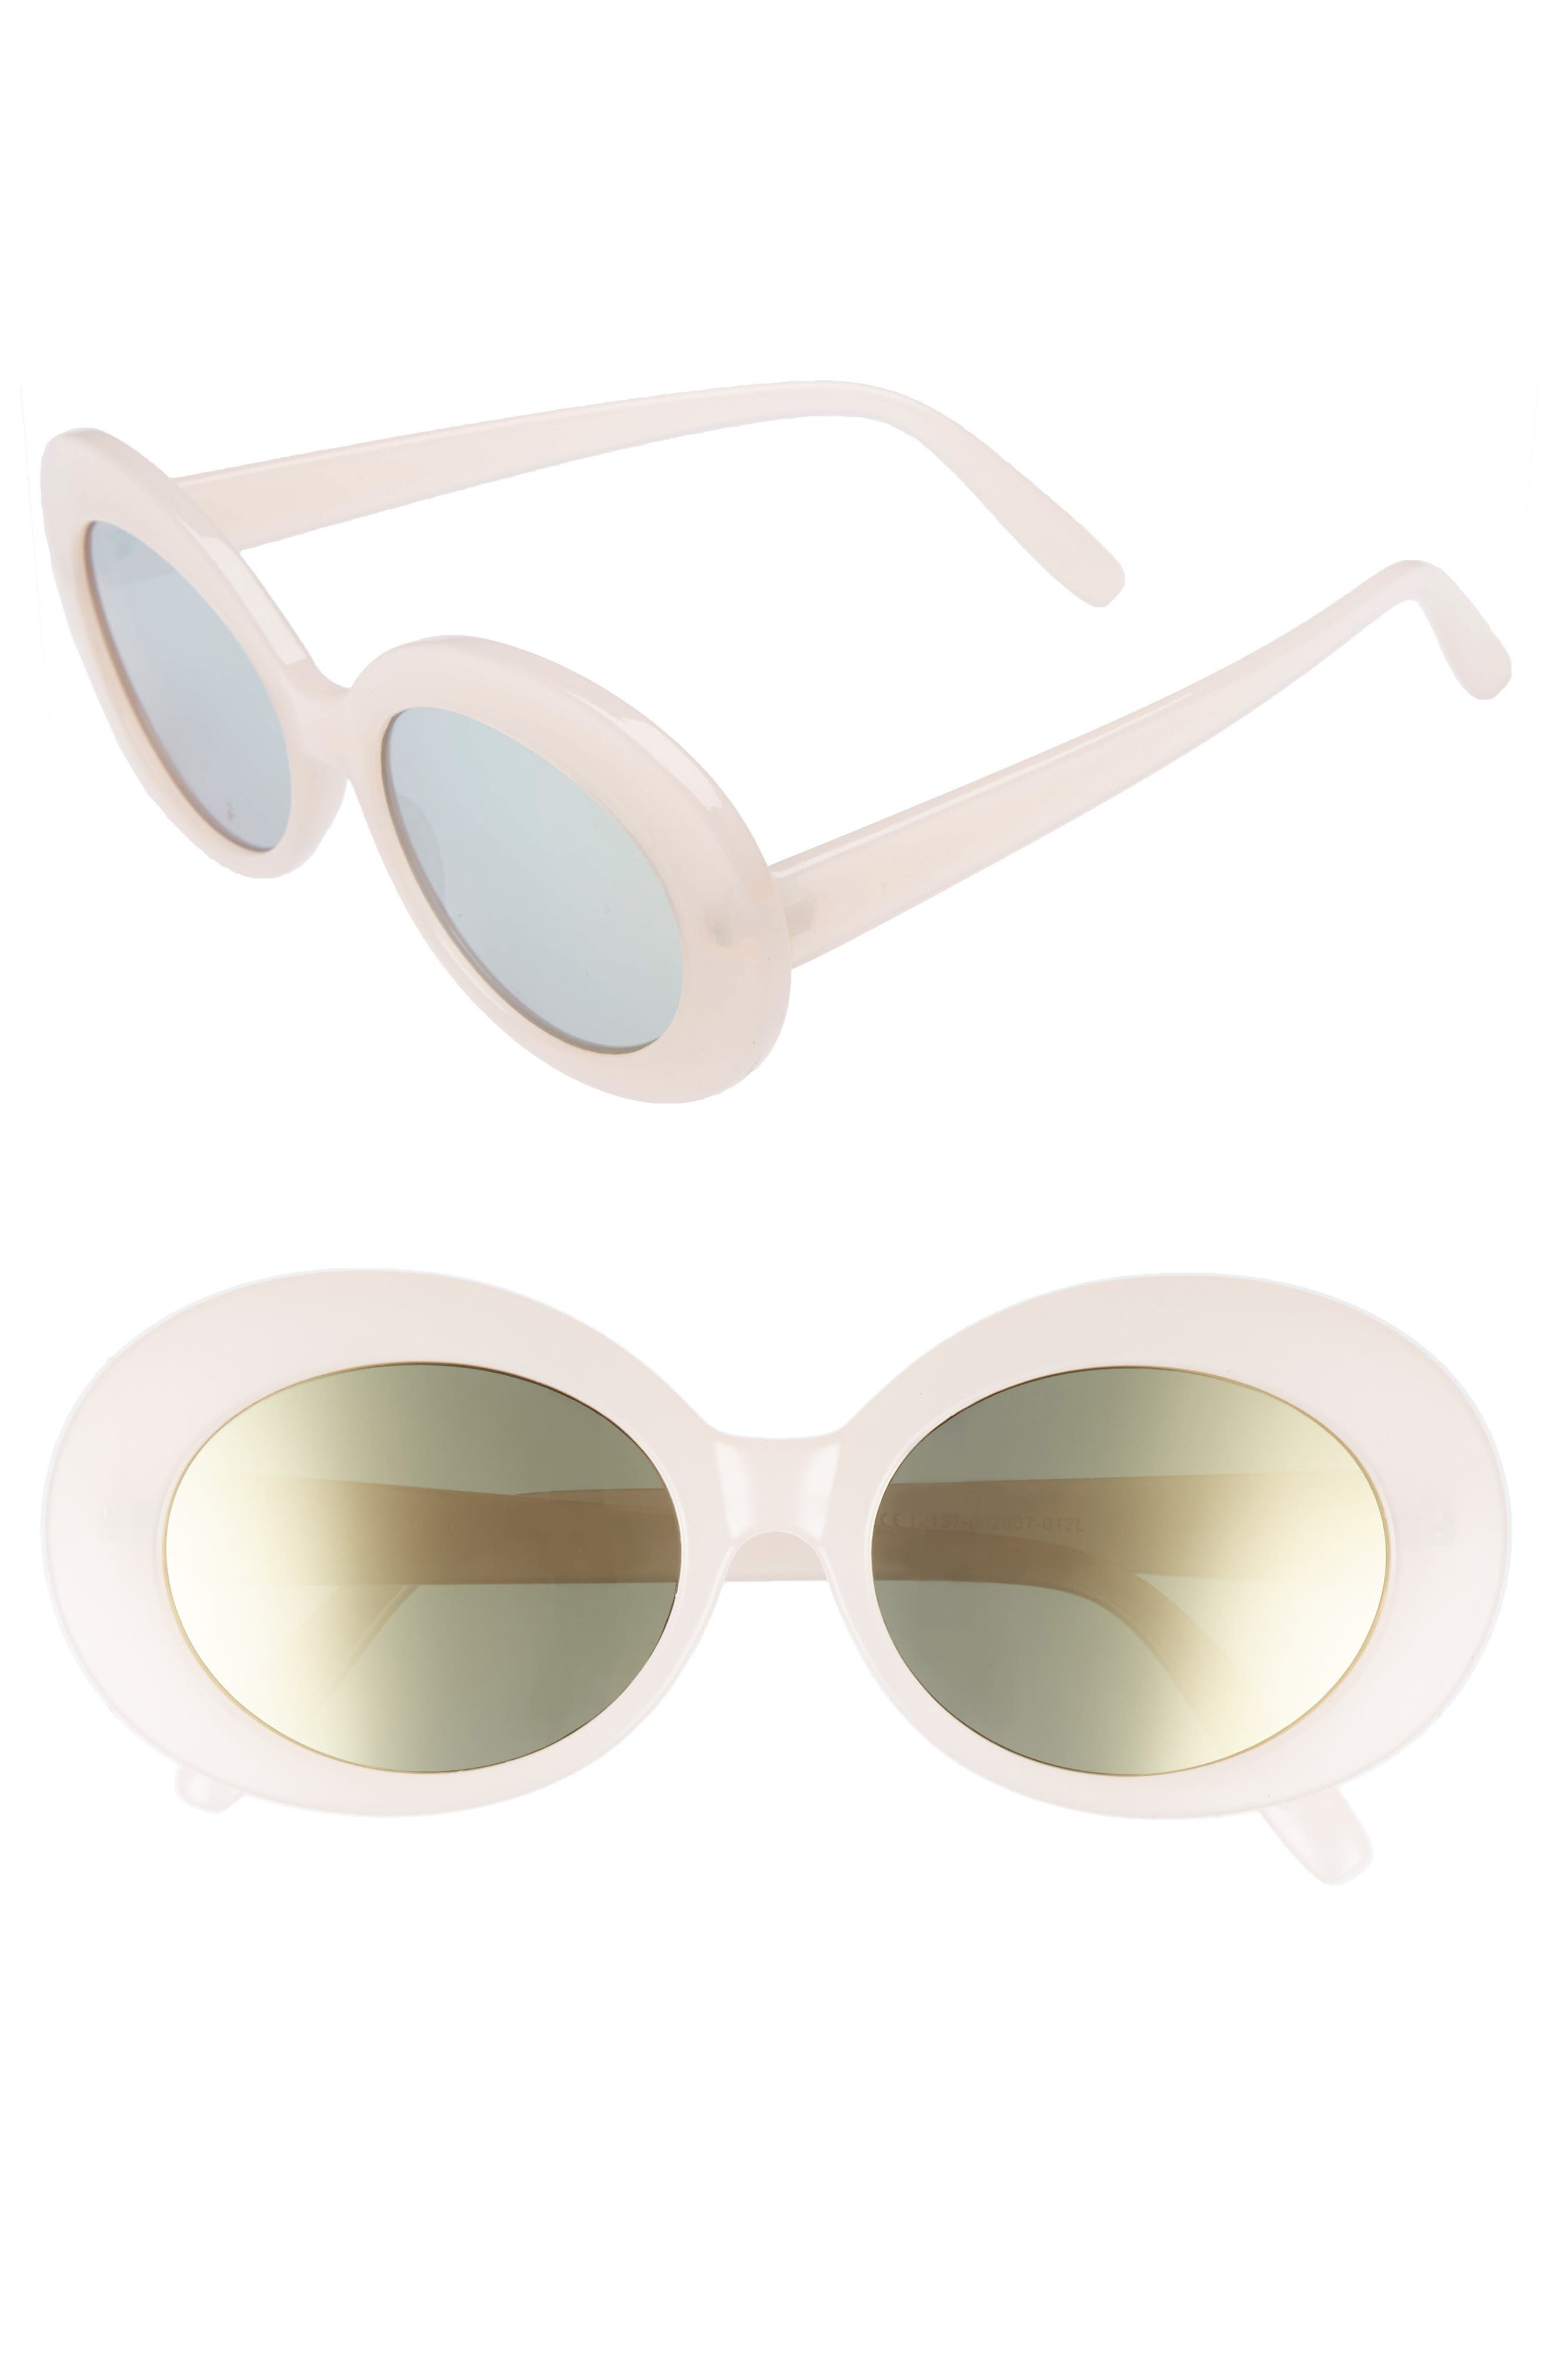 55mm Oval Sunglasses,                             Main thumbnail 1, color,                             650